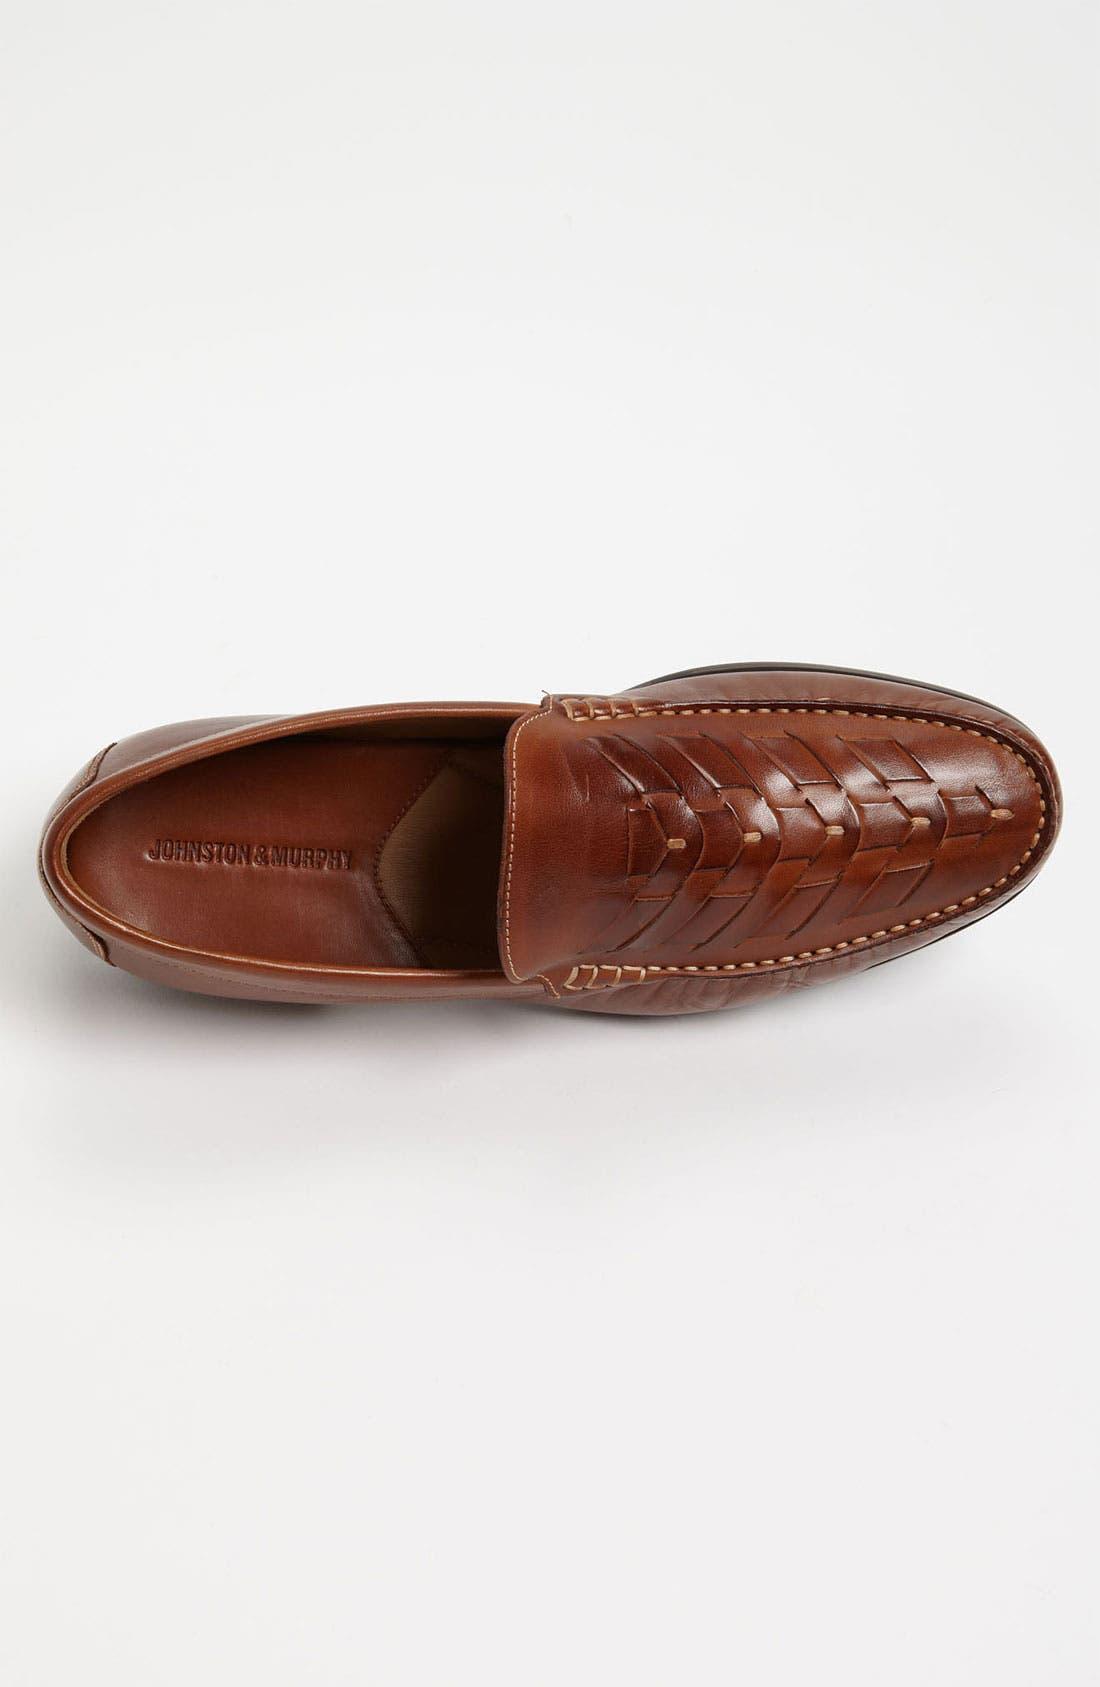 Alternate Image 3  - Johnston & Murphy 'Cresswell' Loafer (Online Only)